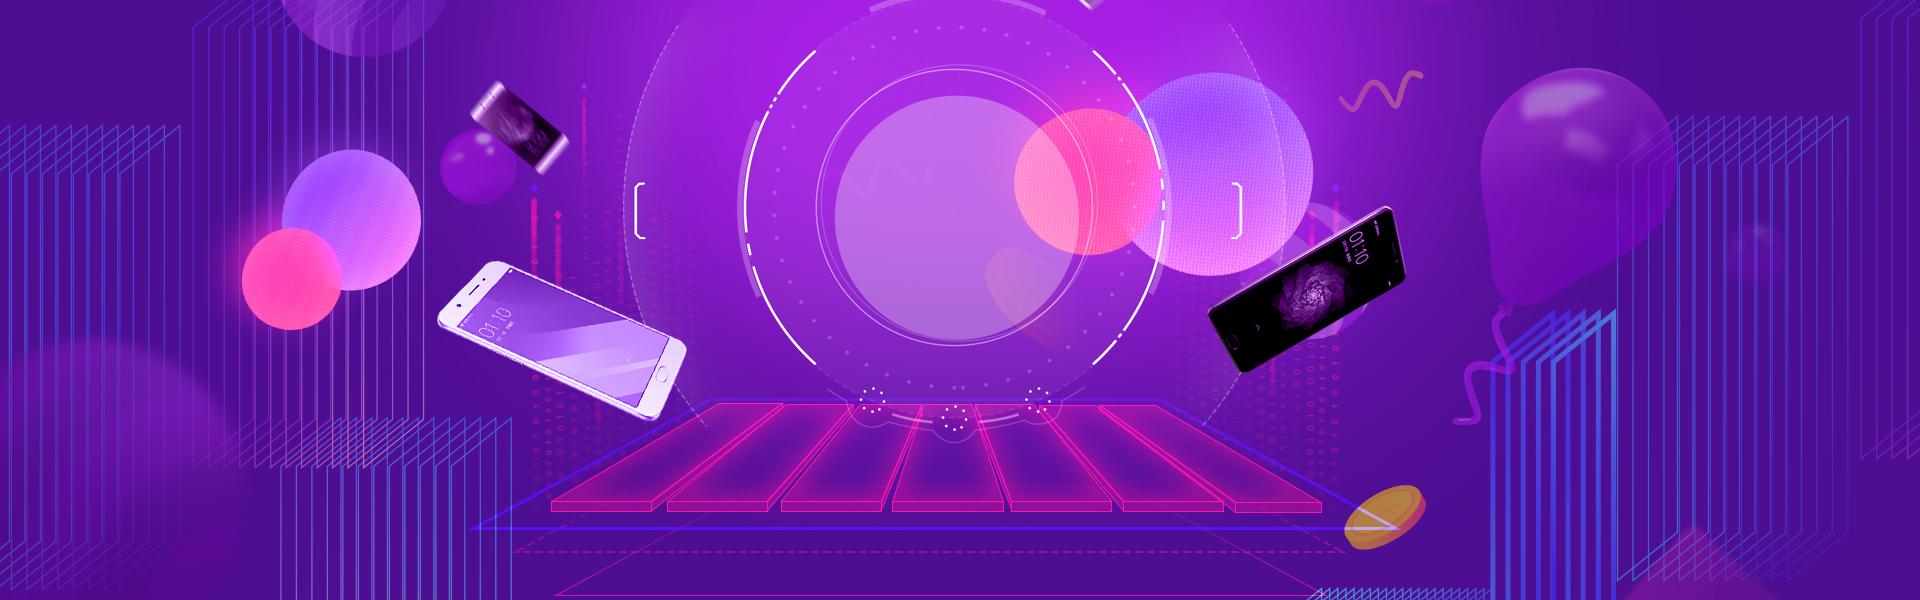 818 mobile phone promotion purple geometric background